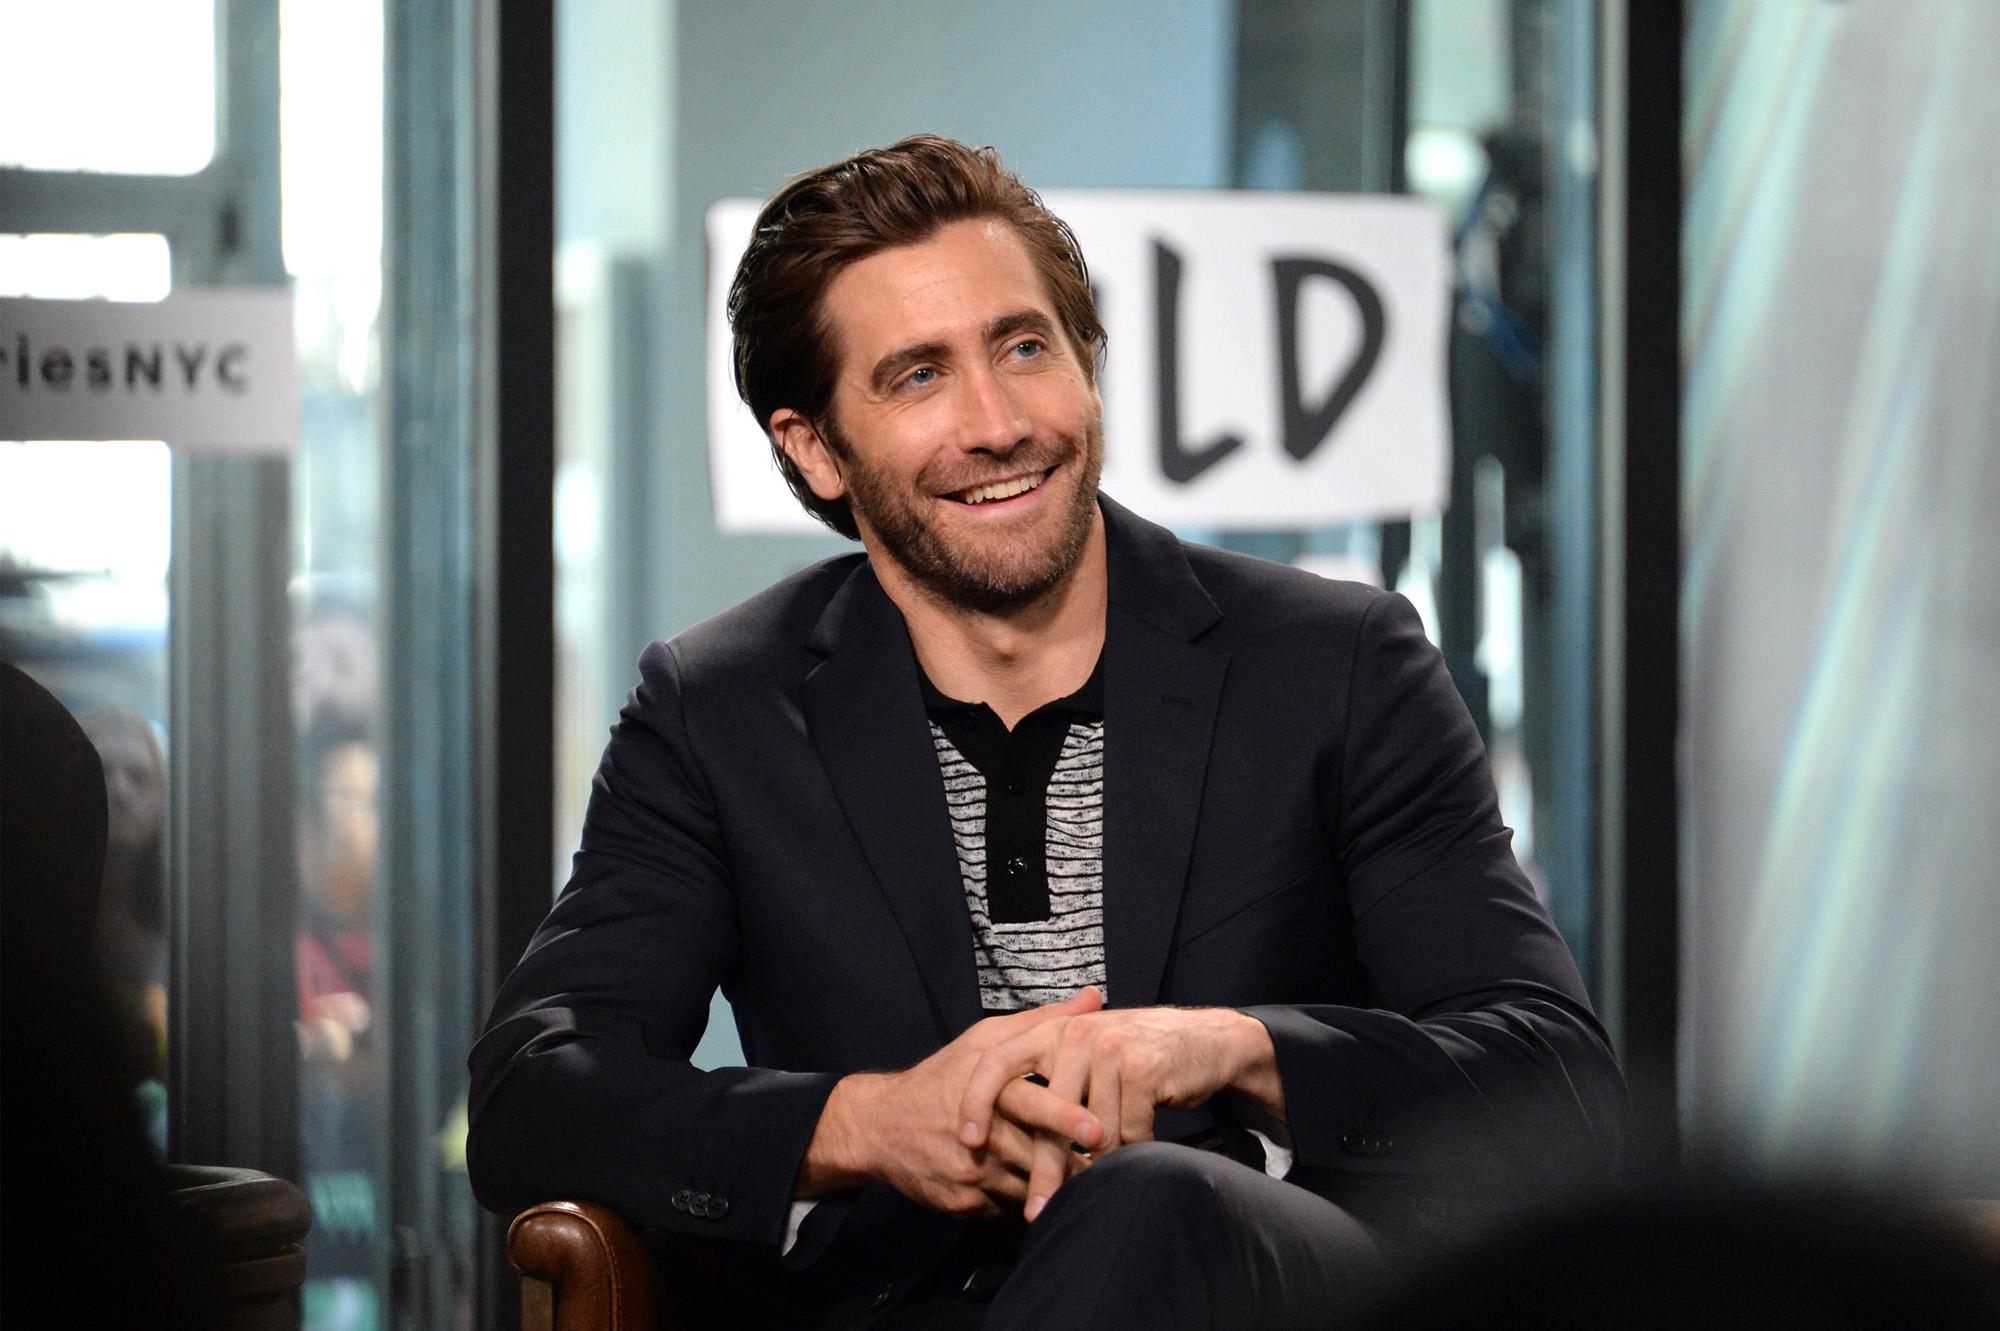 Live where gyllenhaal does jake Photo: Everyone